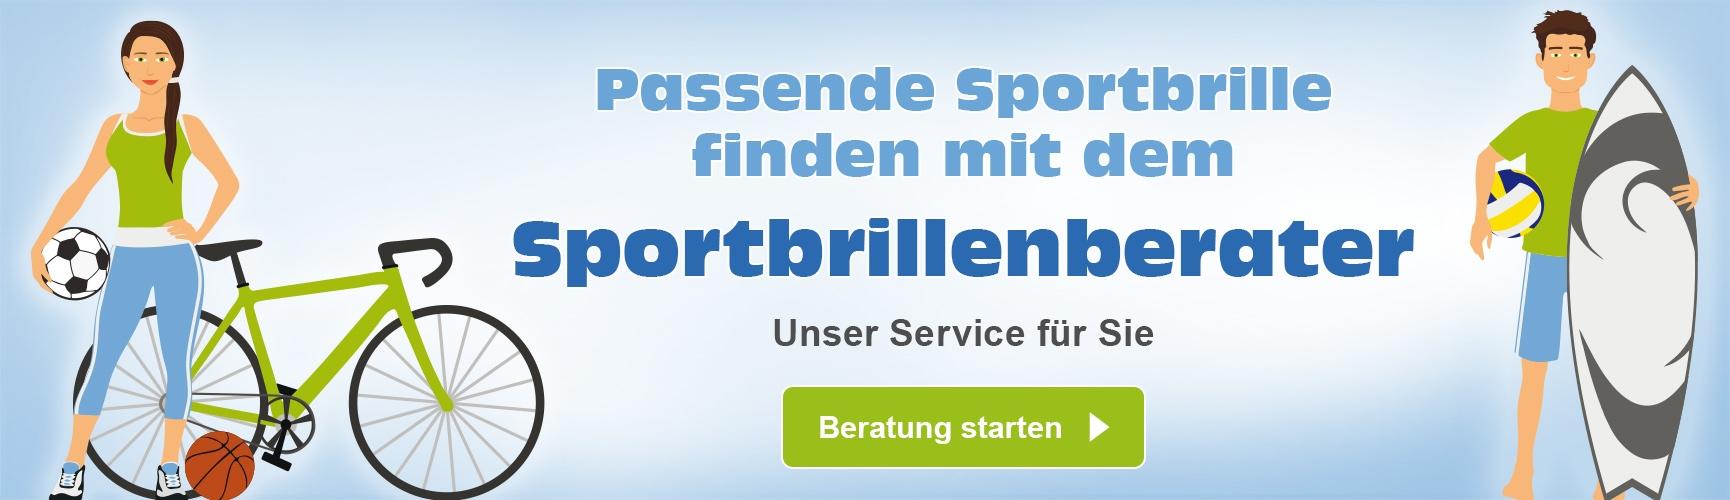 Sportbrillenberater Banner